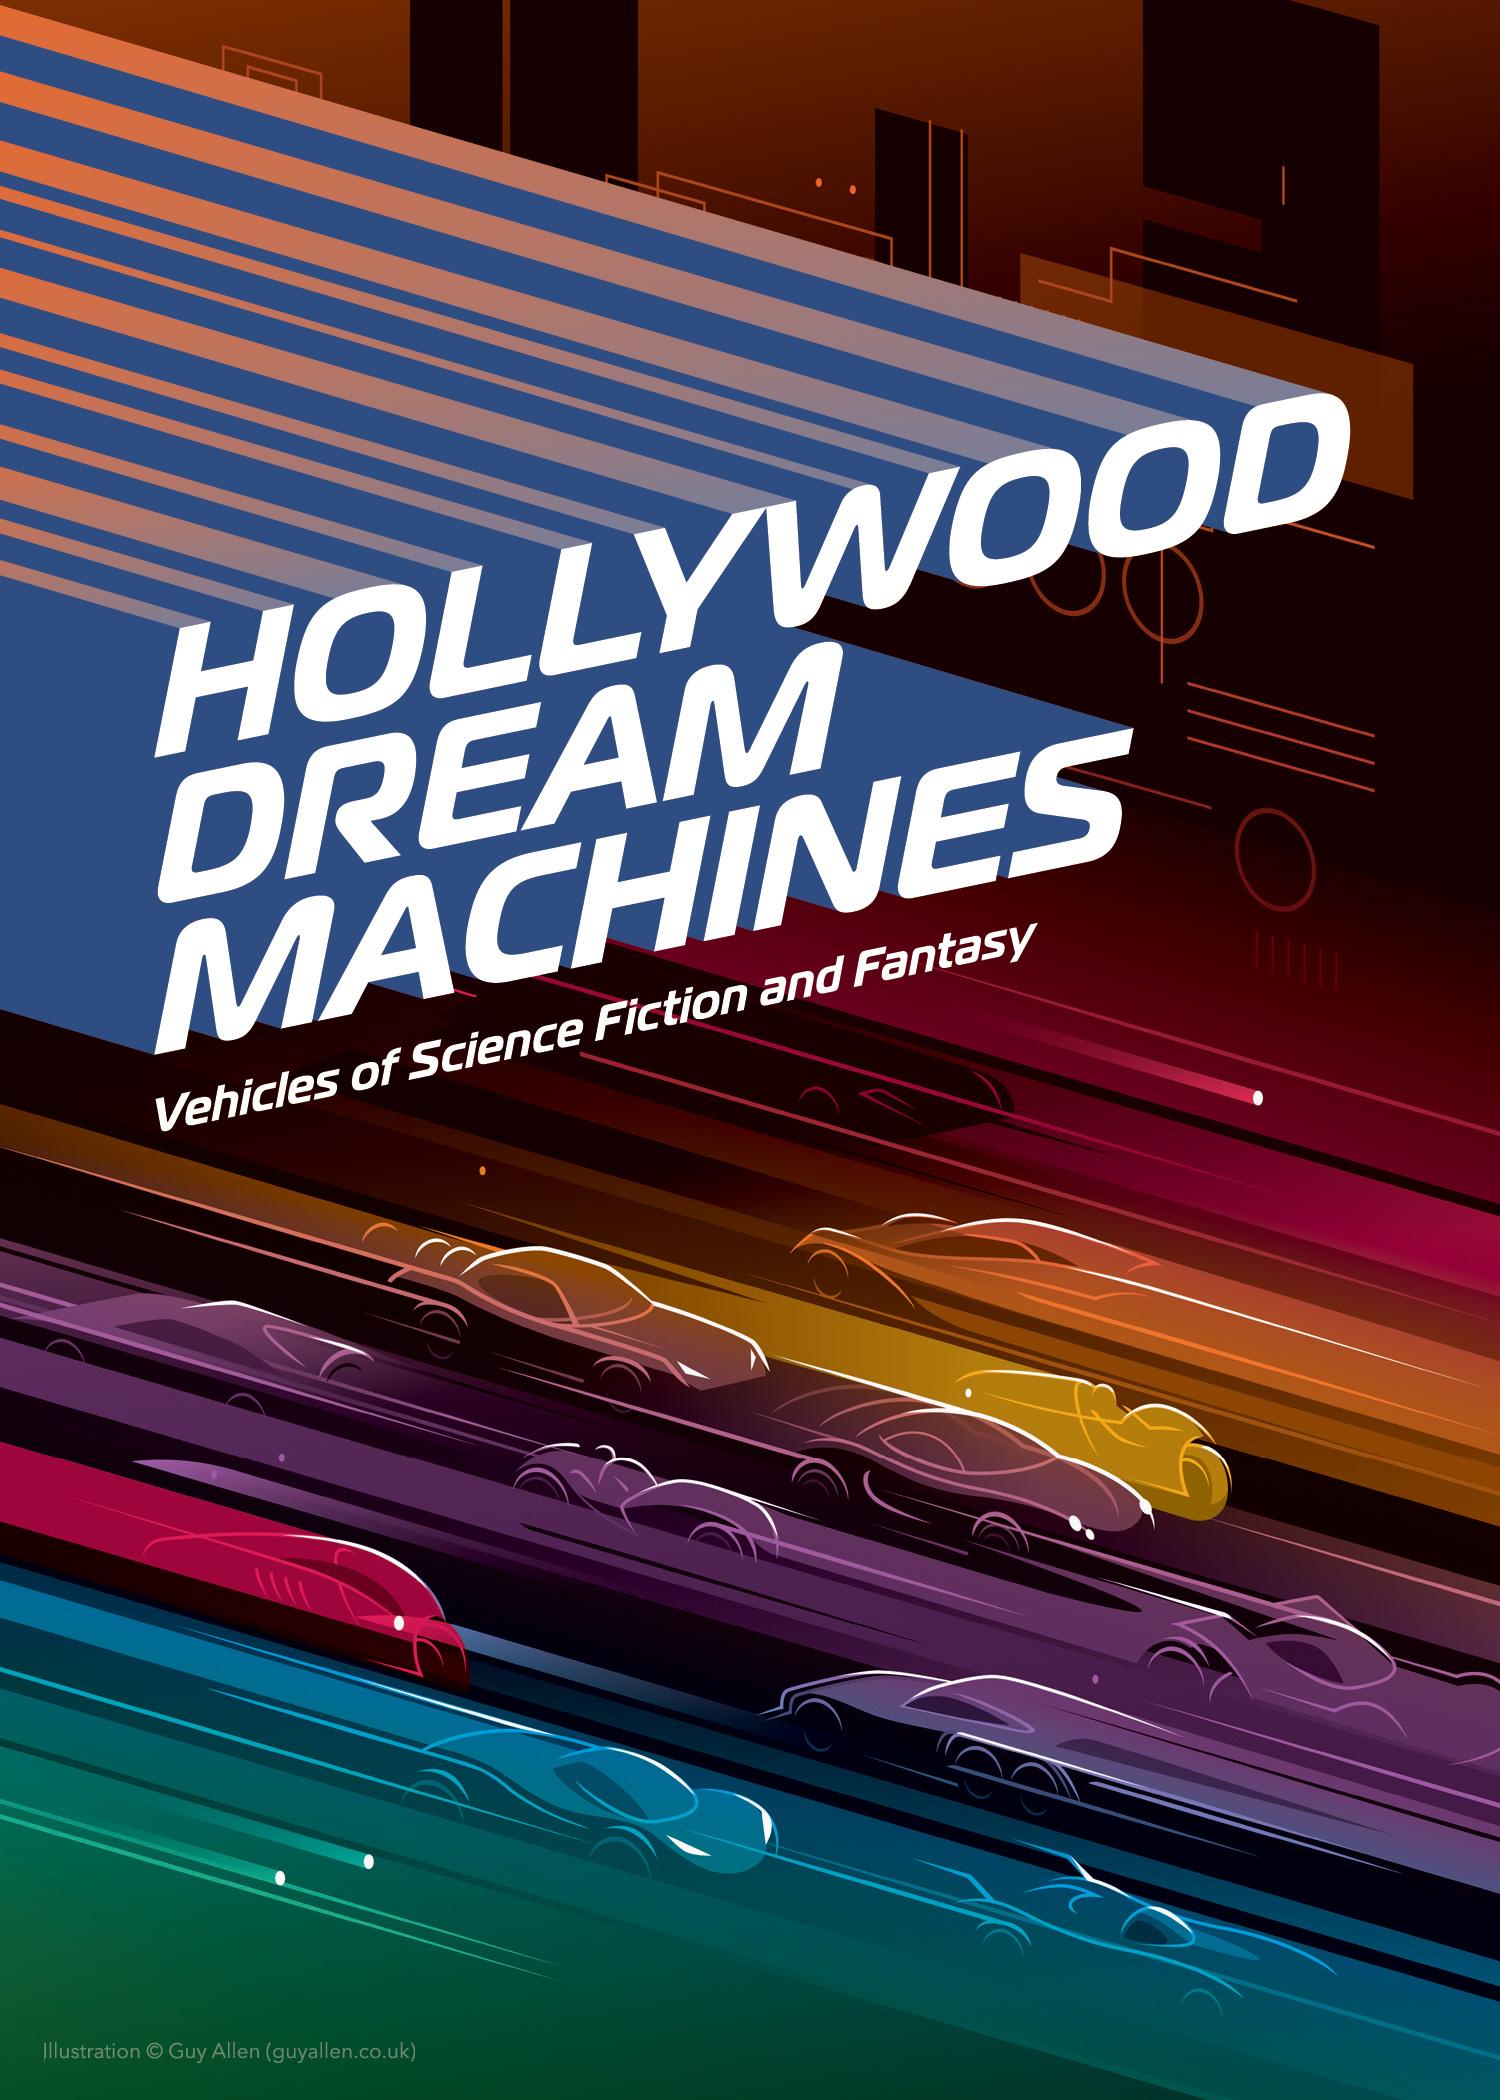 Hollywood Dream Machines exhibit